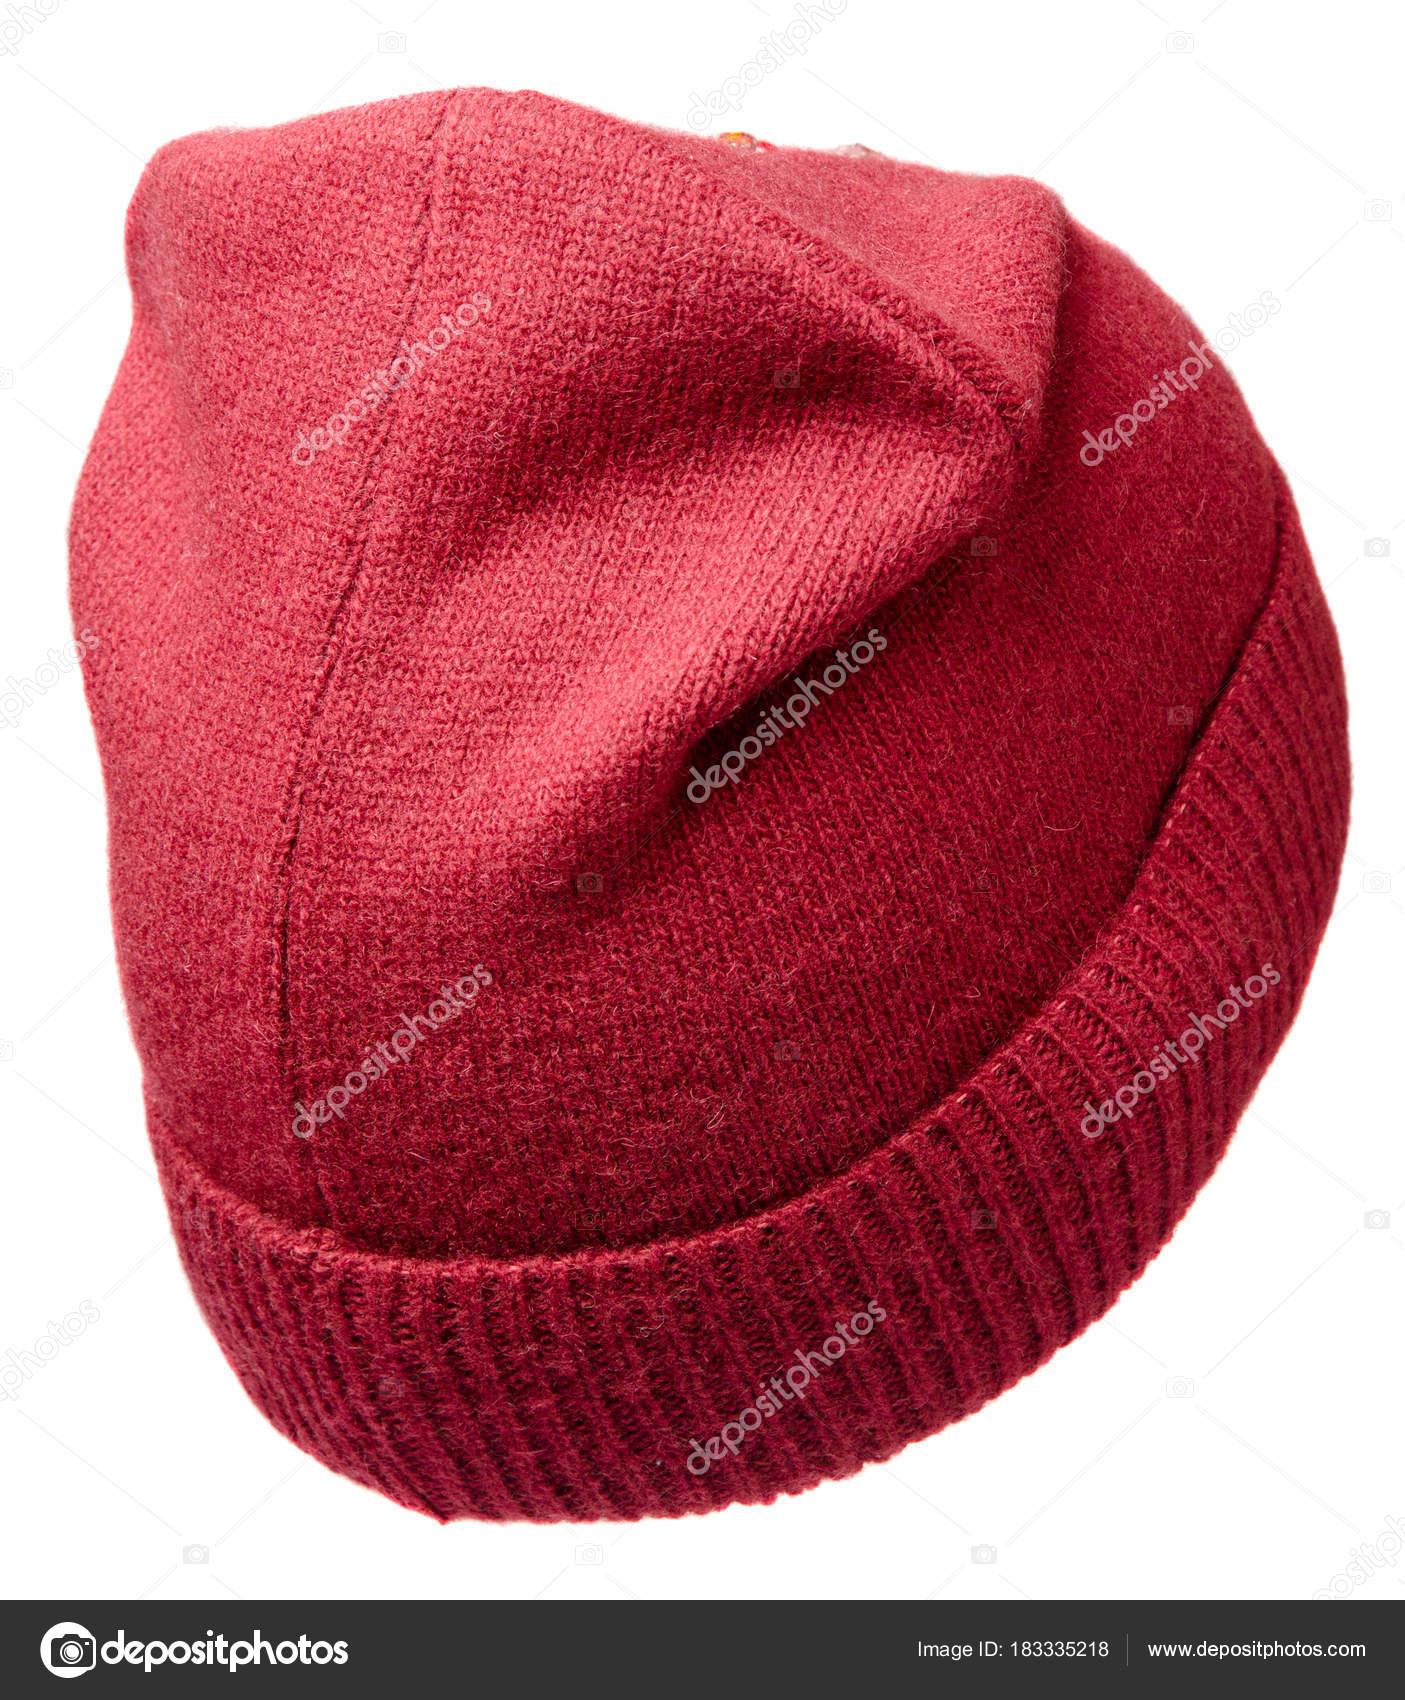 fac45655e6 Γυναικείο καπέλο. πλεκτό καπέλο που απομονώνονται σε λευκό φόντο — Εικόνα  από ...